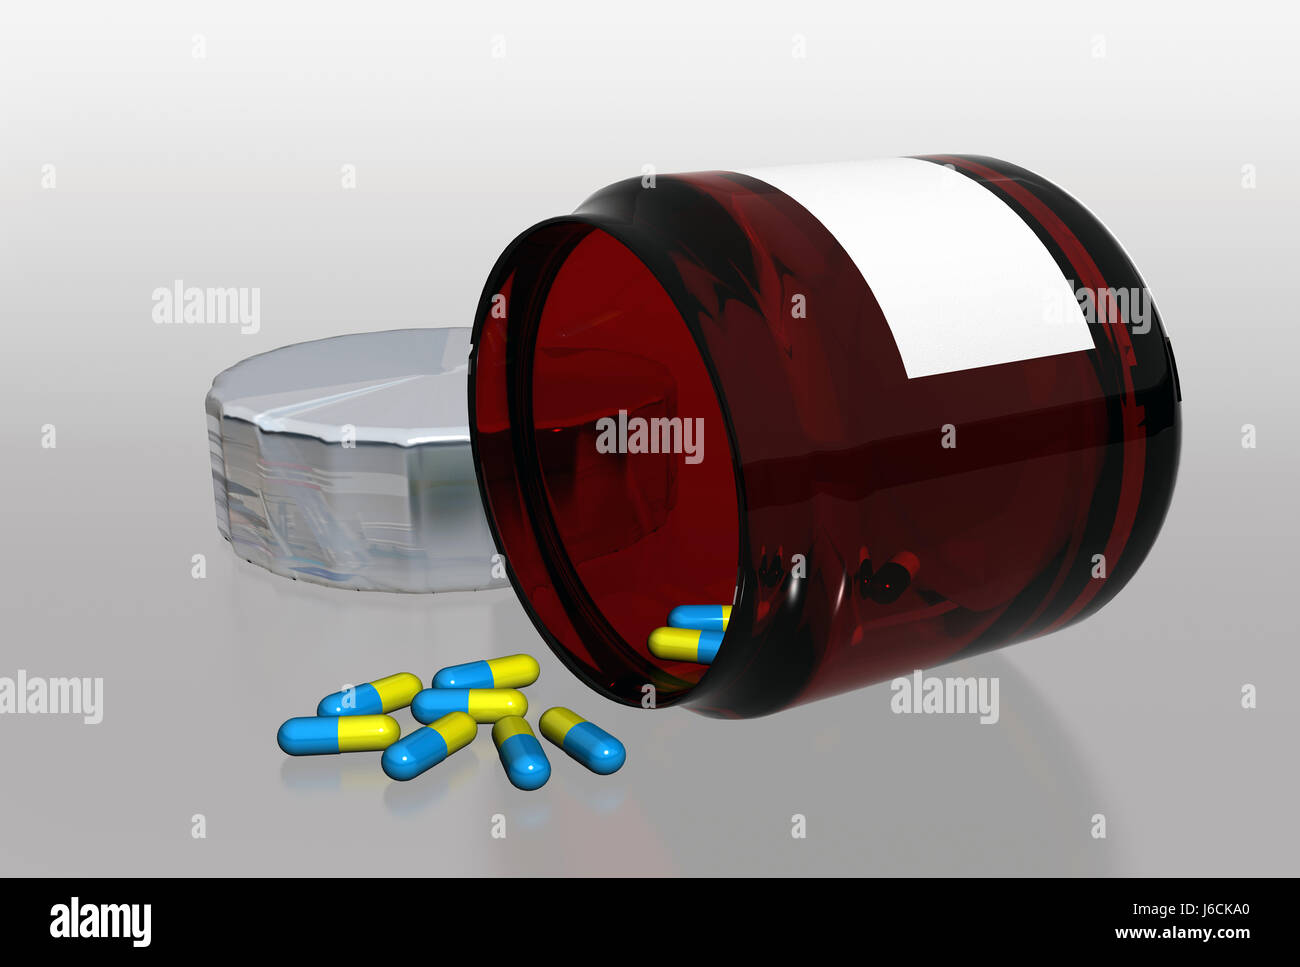 health medicinally medical bottle material drug anaesthetic addictive drug - Stock Image